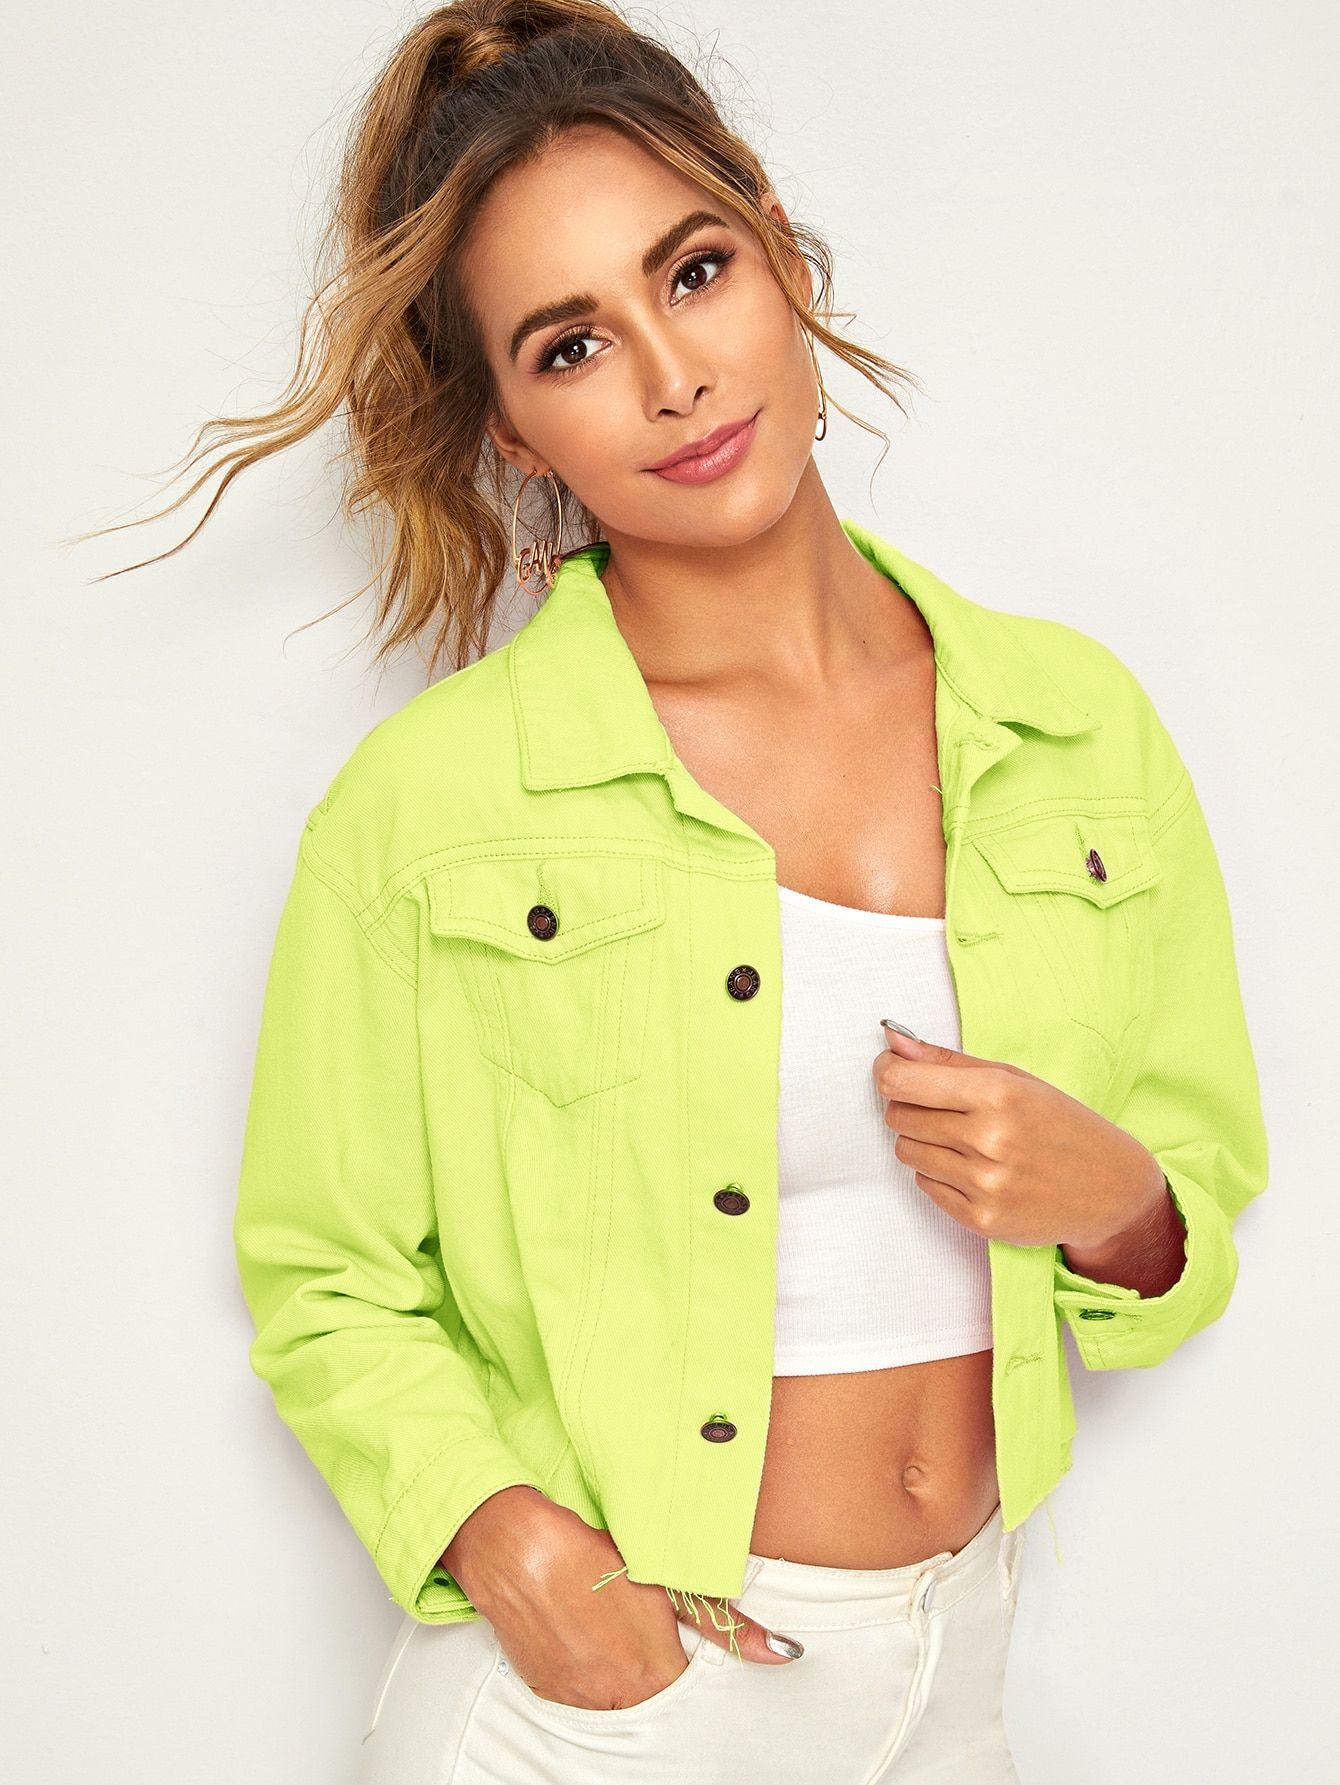 Ad Neon Green Raw Hem Crop Denim Jacket Tags Casual Green Bright Plain Collar Crop Other Raw Hem Lon Cropped Denim Denim Jacket Cropped Denim Jacket [ 1785 x 1340 Pixel ]